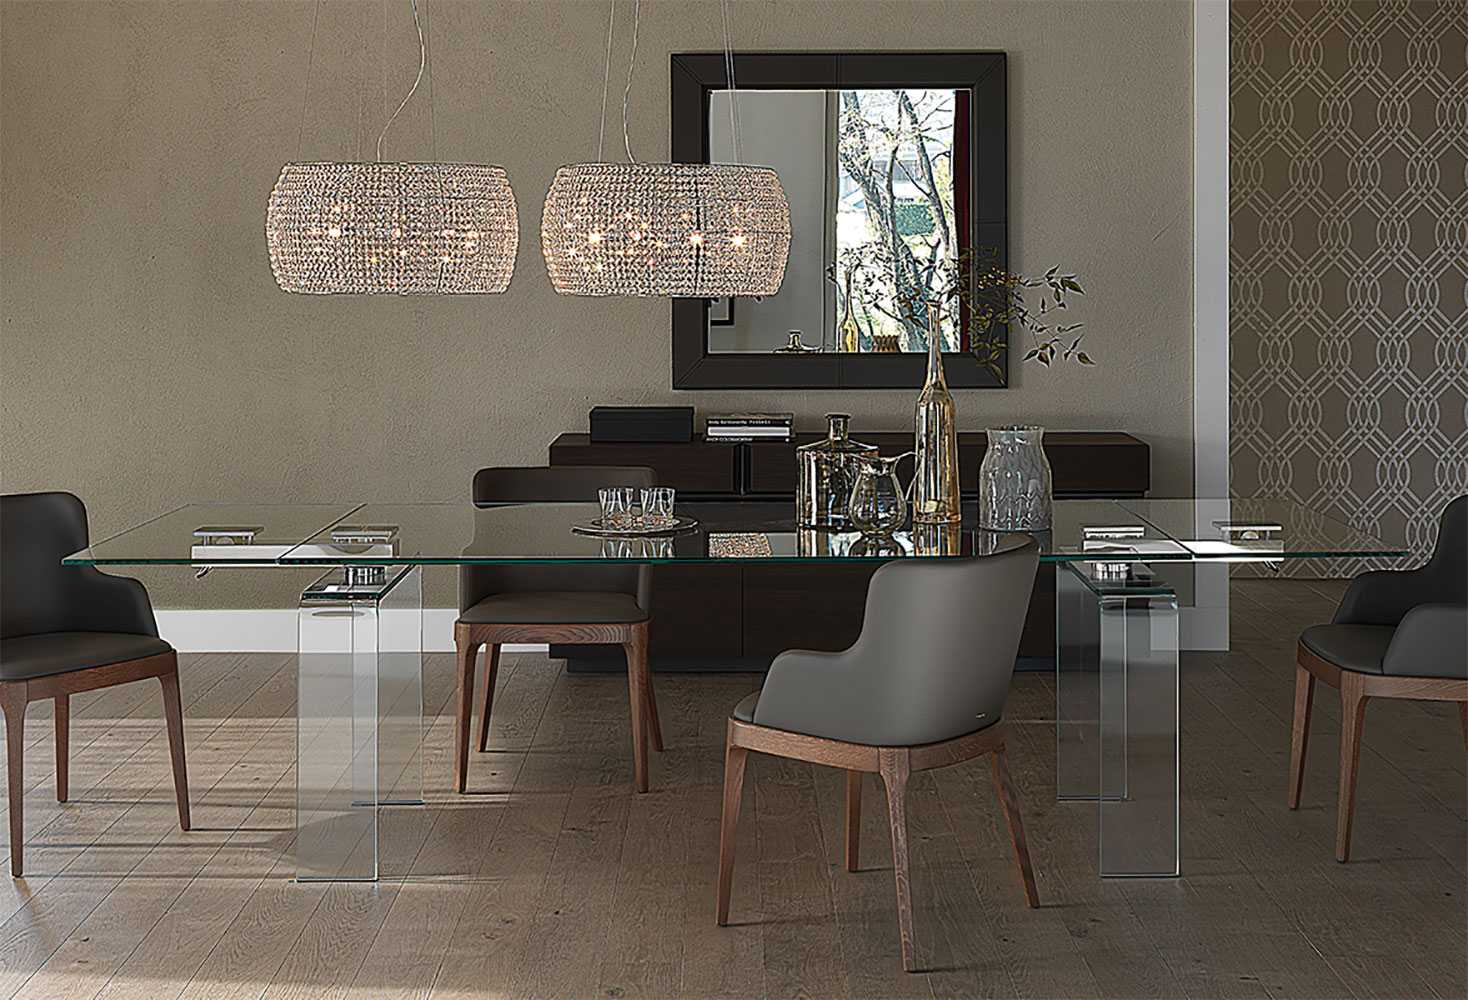 AZIMUT- שולחן אוכל נפתח- קטאלן איטליה, הקומה השנייה